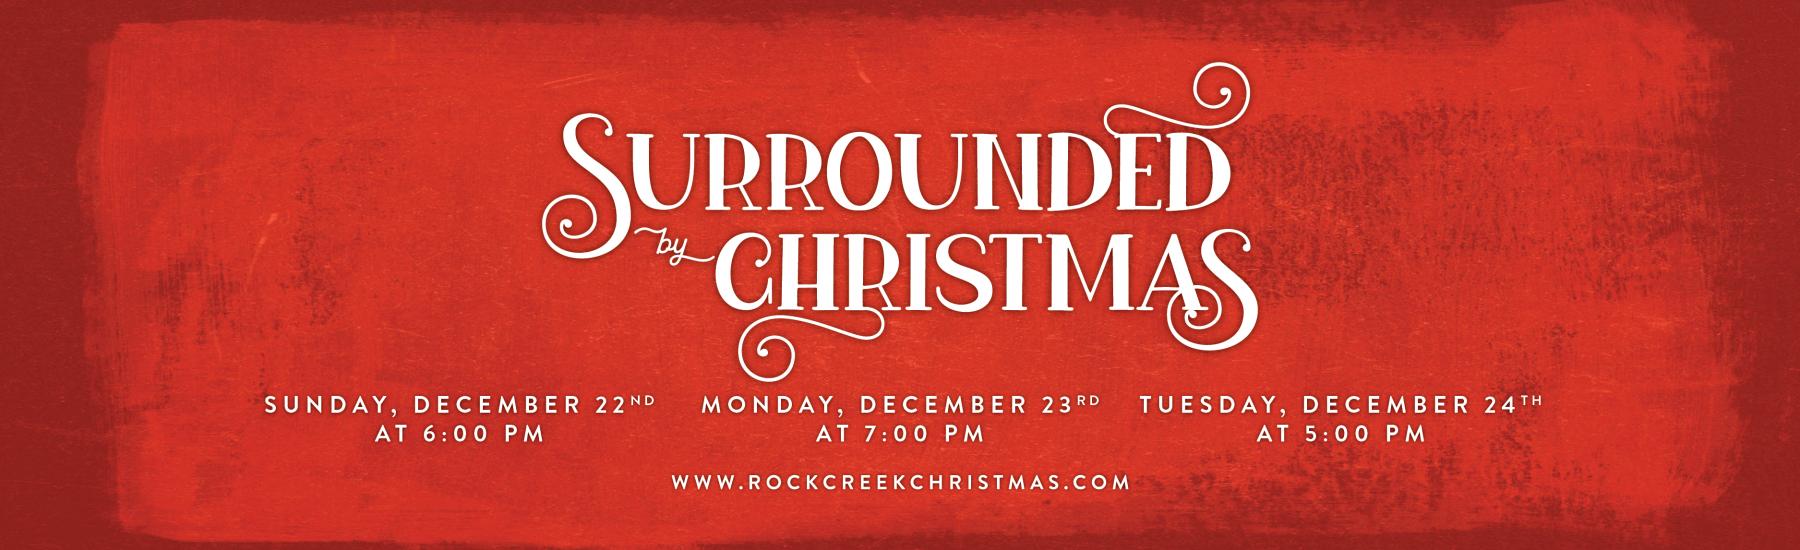 Rock Creek Christmas